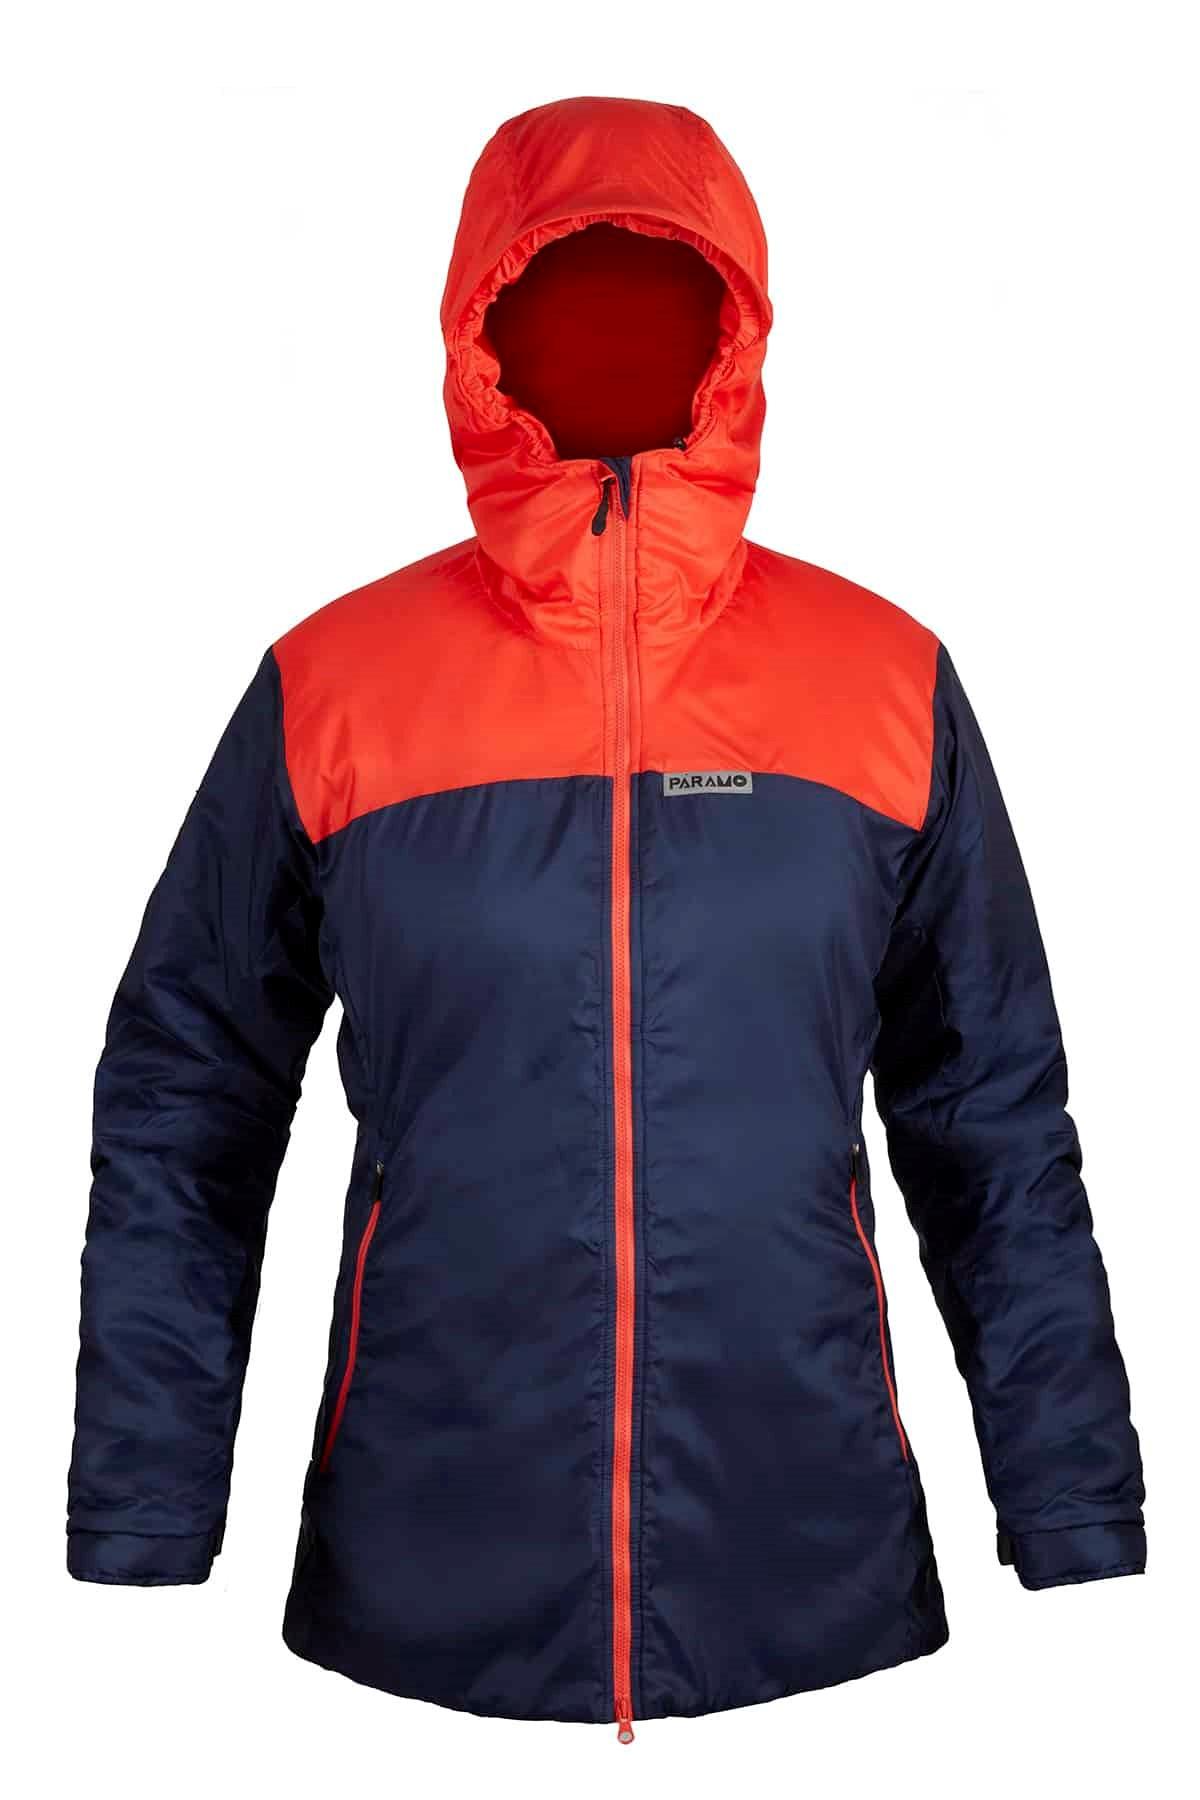 New Paramo Cascada Jacket Embossed Moss